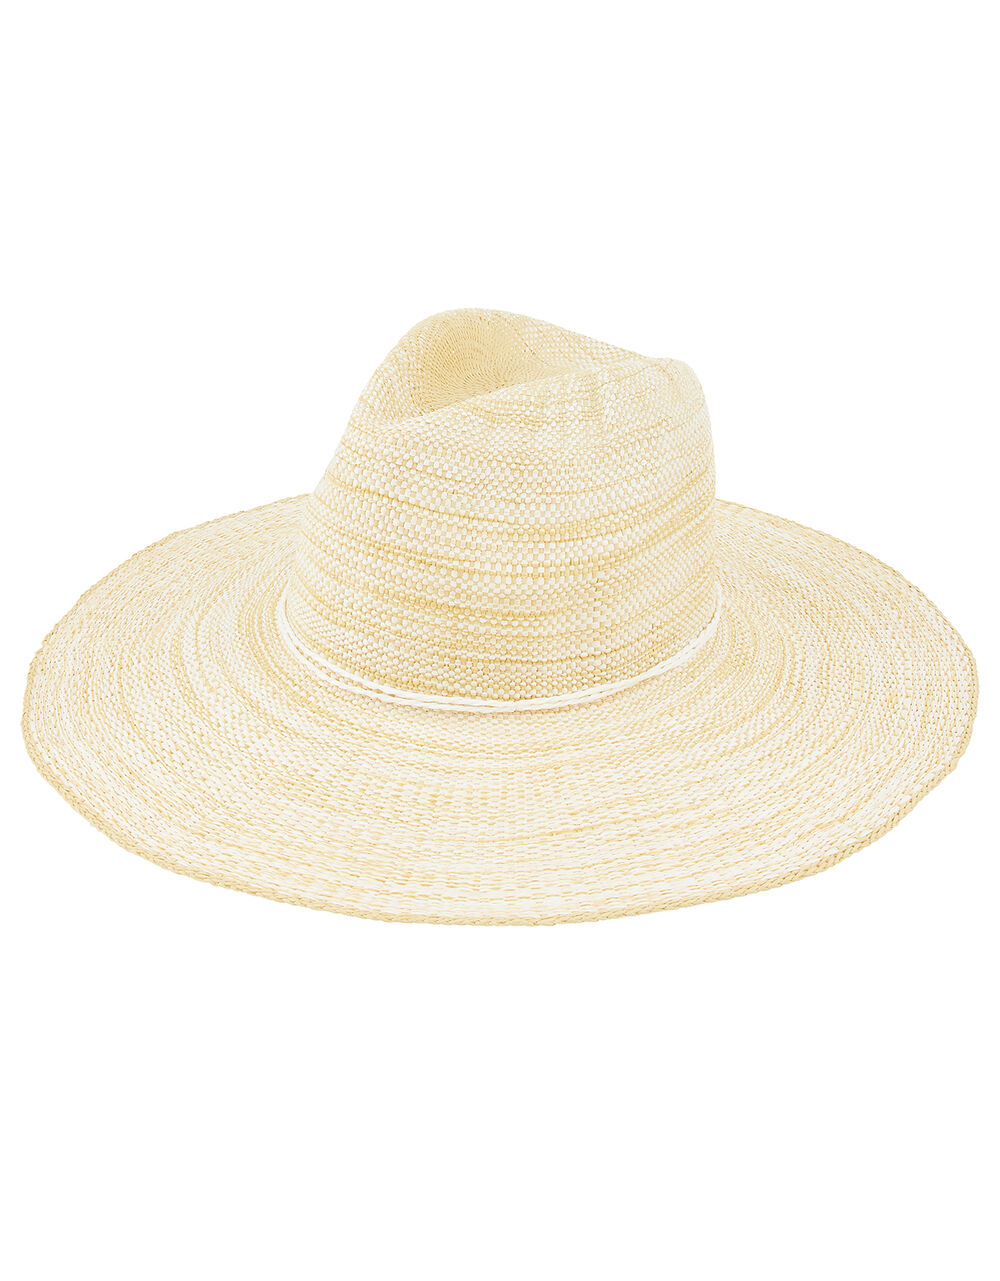 Simple Weave Wide Brim Fedora Hat, Natural (NATURAL), large